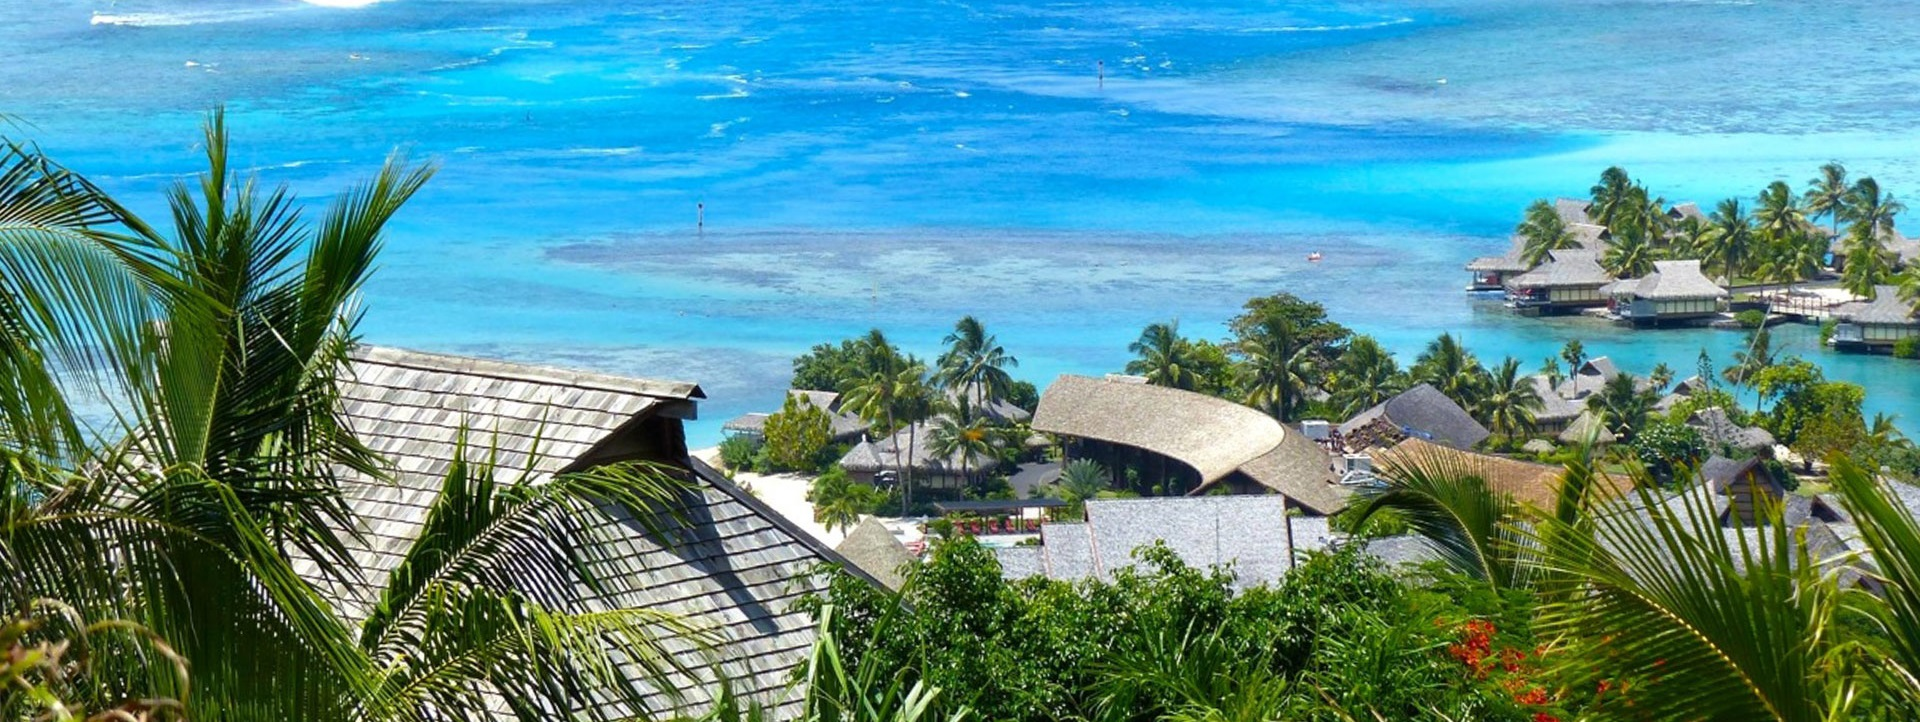 Legends Resort Moorea Tahiti Vacations Bora Bora